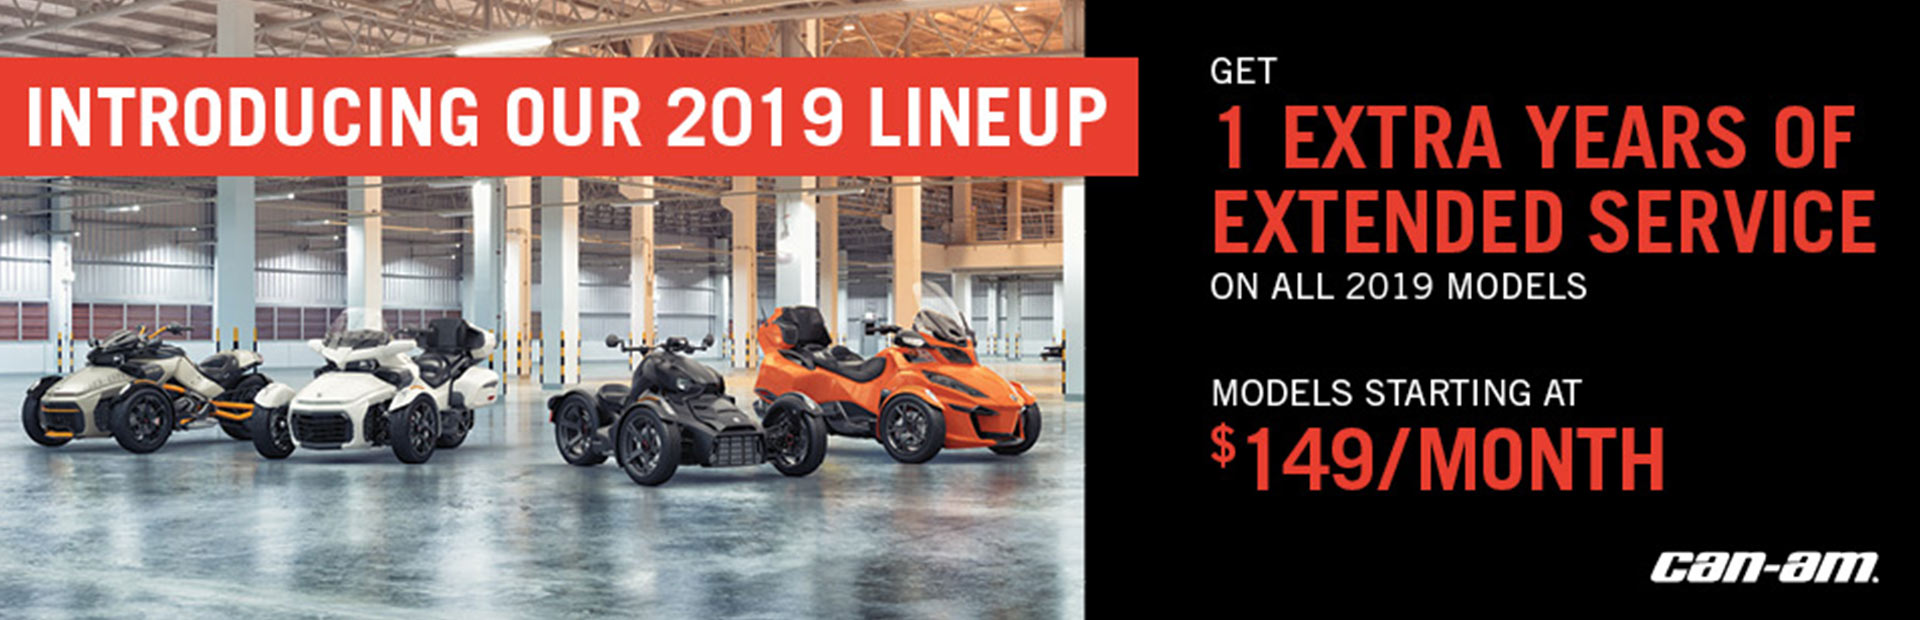 Redding Yamaha Sea Doo Ca Boat Dealer Motorcycle Golf Cart Engine Diagram Pre Season Sales Event Spyder